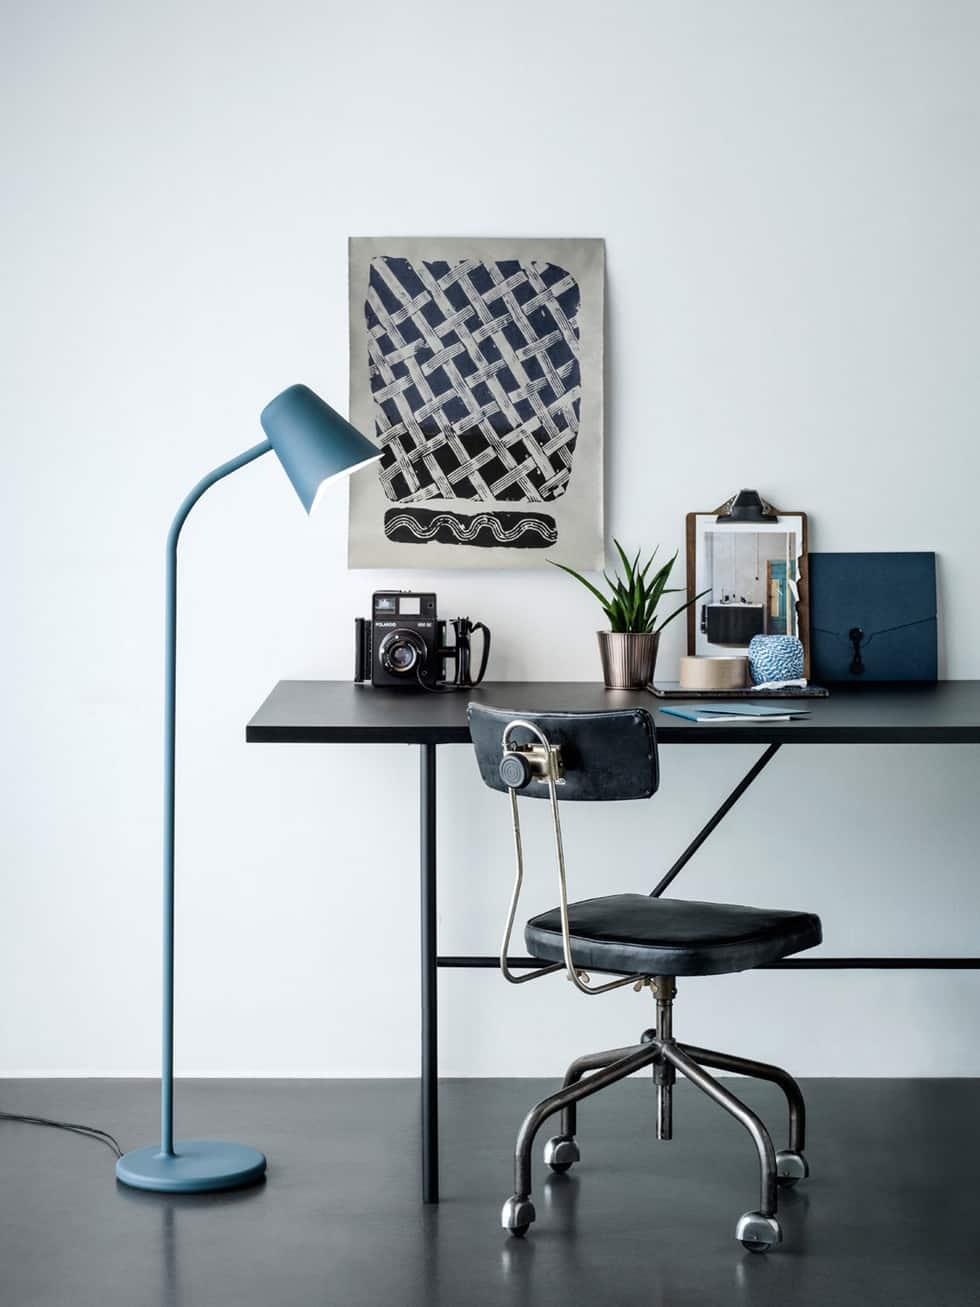 me_petrol_blue_desk-northern-lighting_photo-chris-tonnesen-E1k_BcAx7XQwORdbJlFWcA